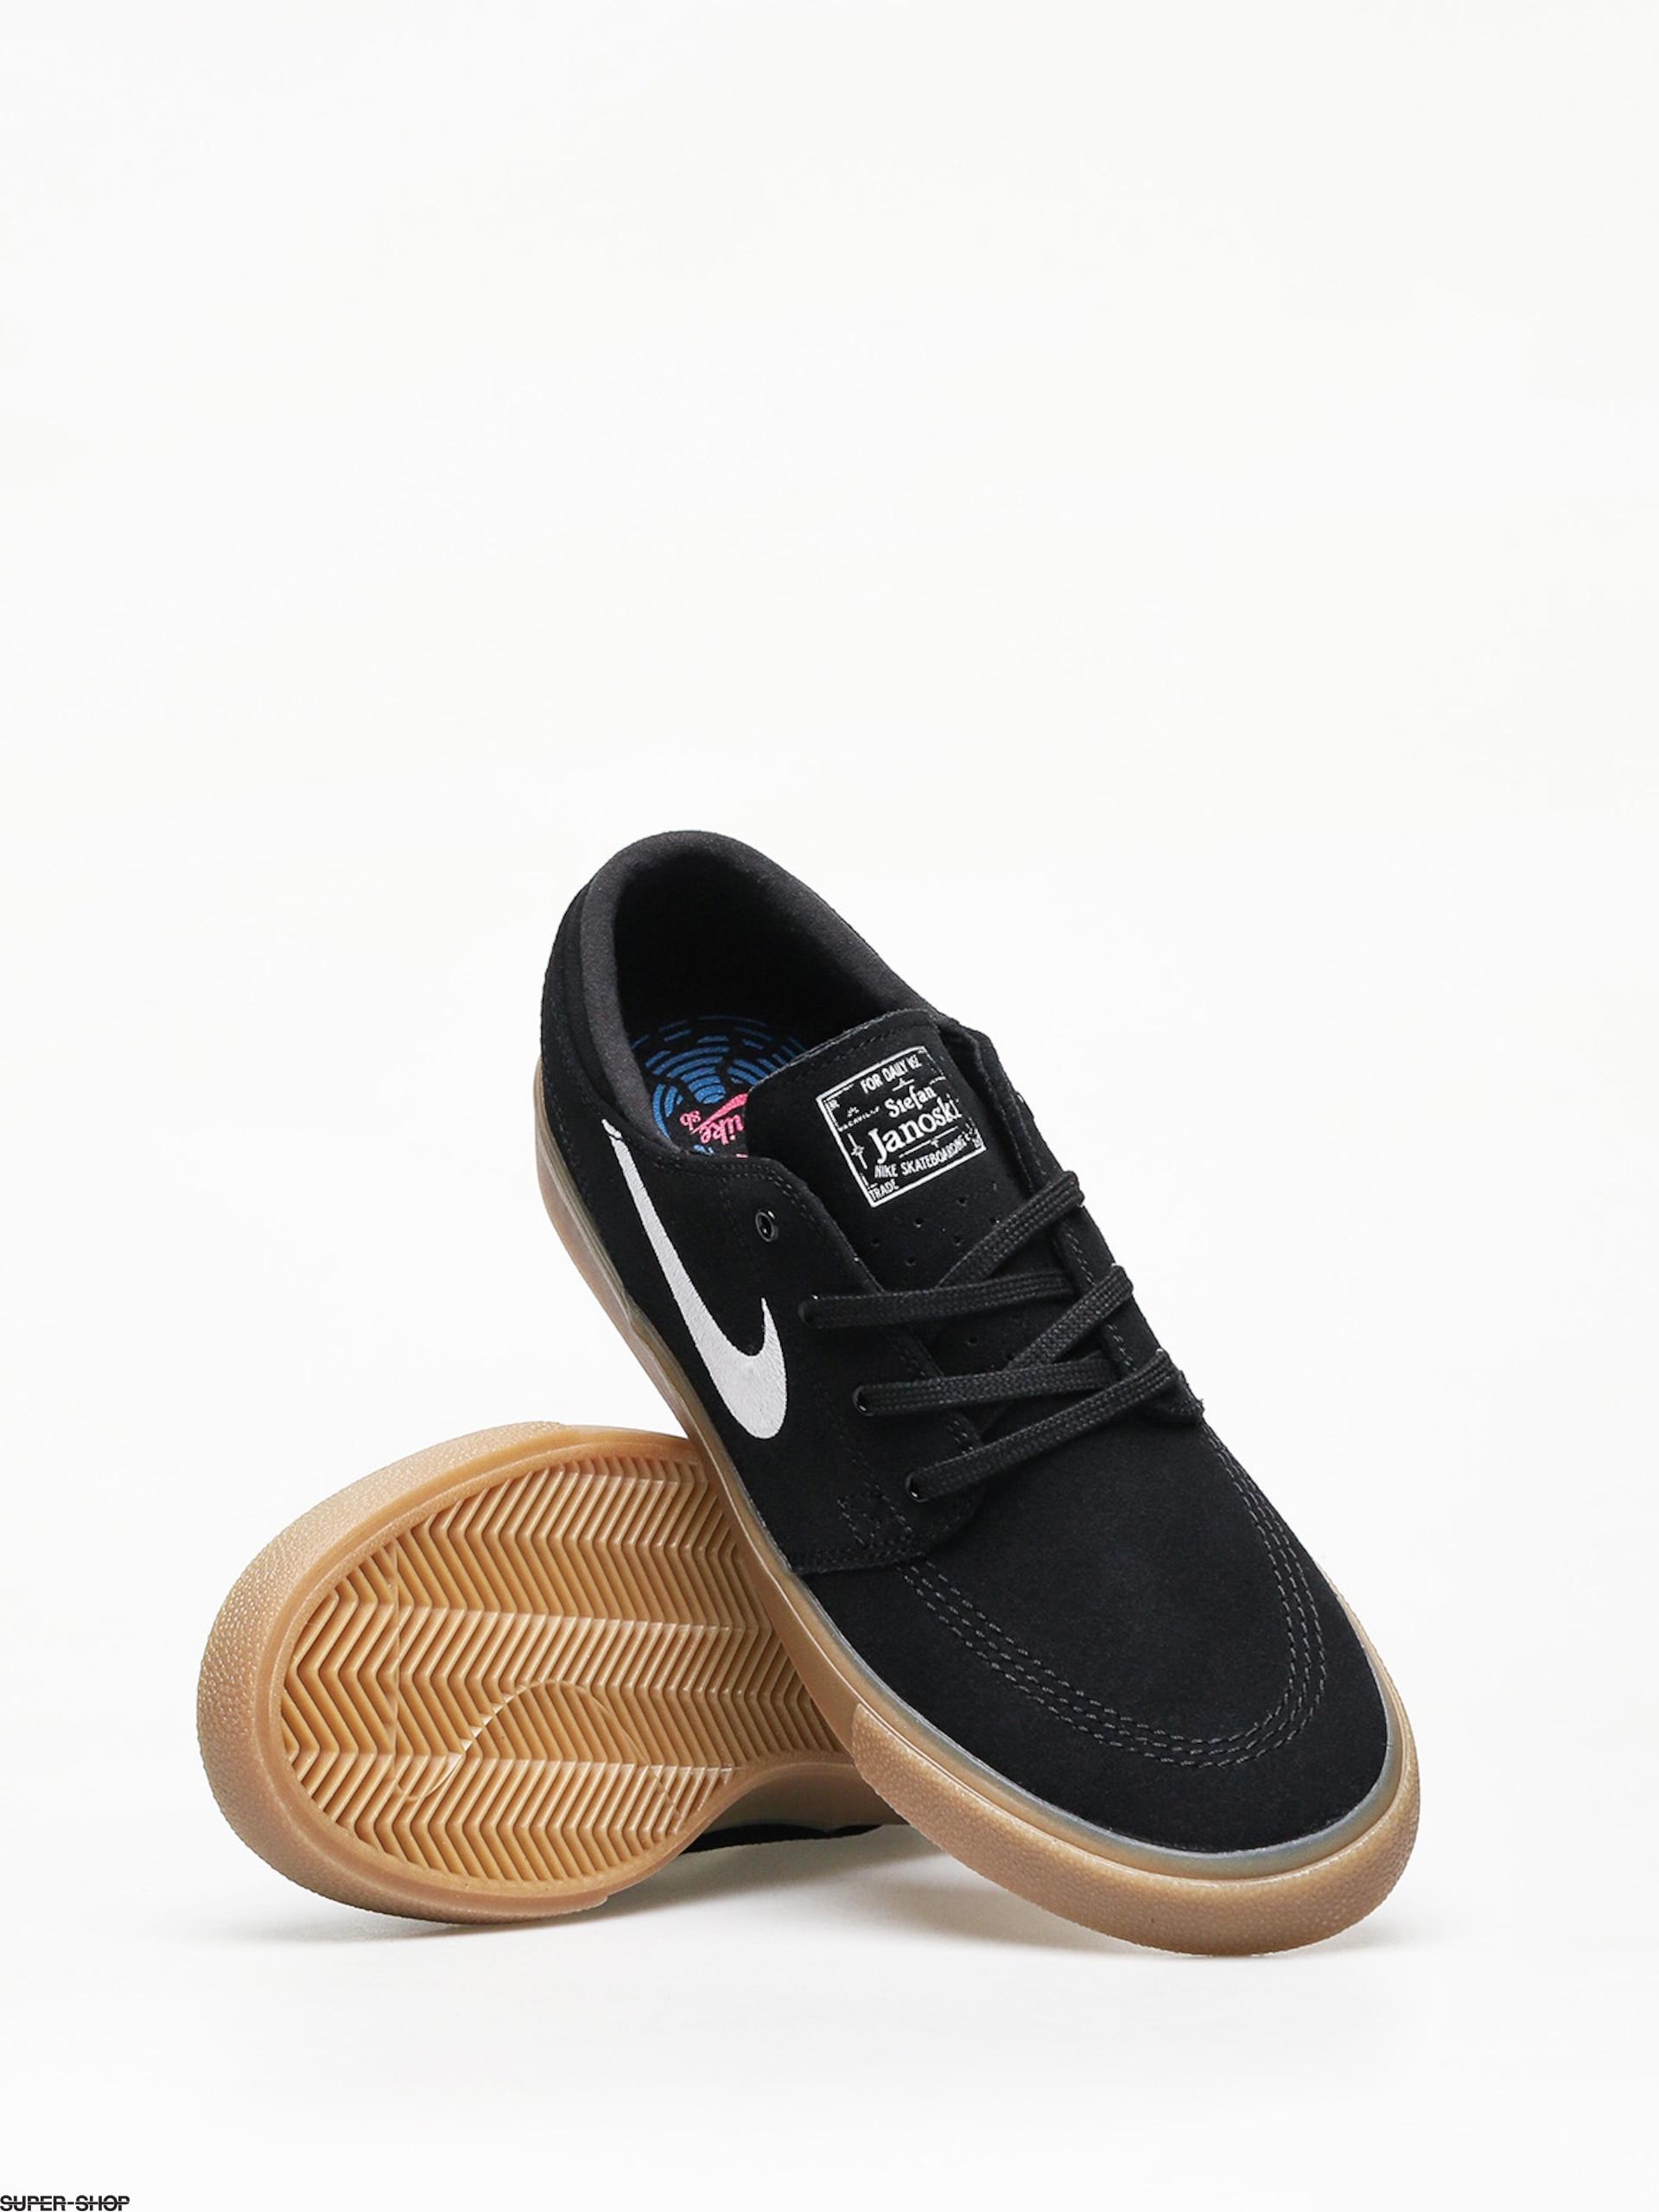 Misionero contar hasta Hobart  Nike SB Zoom Janoski Rm Shoes (black/white black gum light brown)